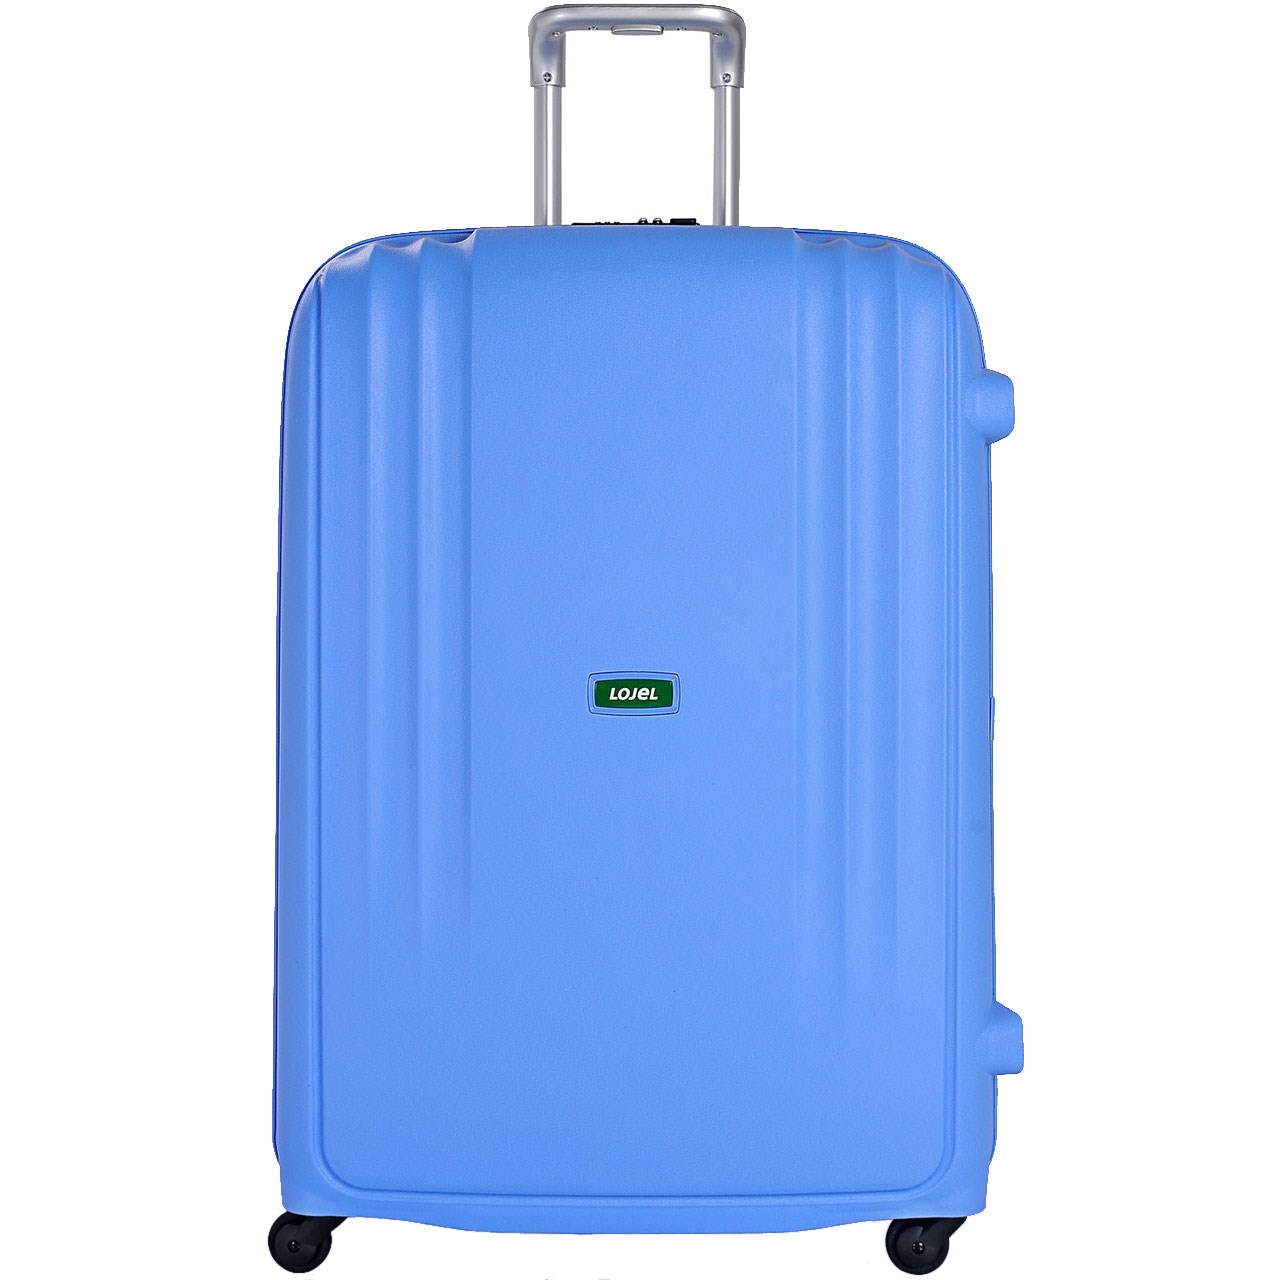 چمدان لوجل مدل Streamline سایز بزرگ